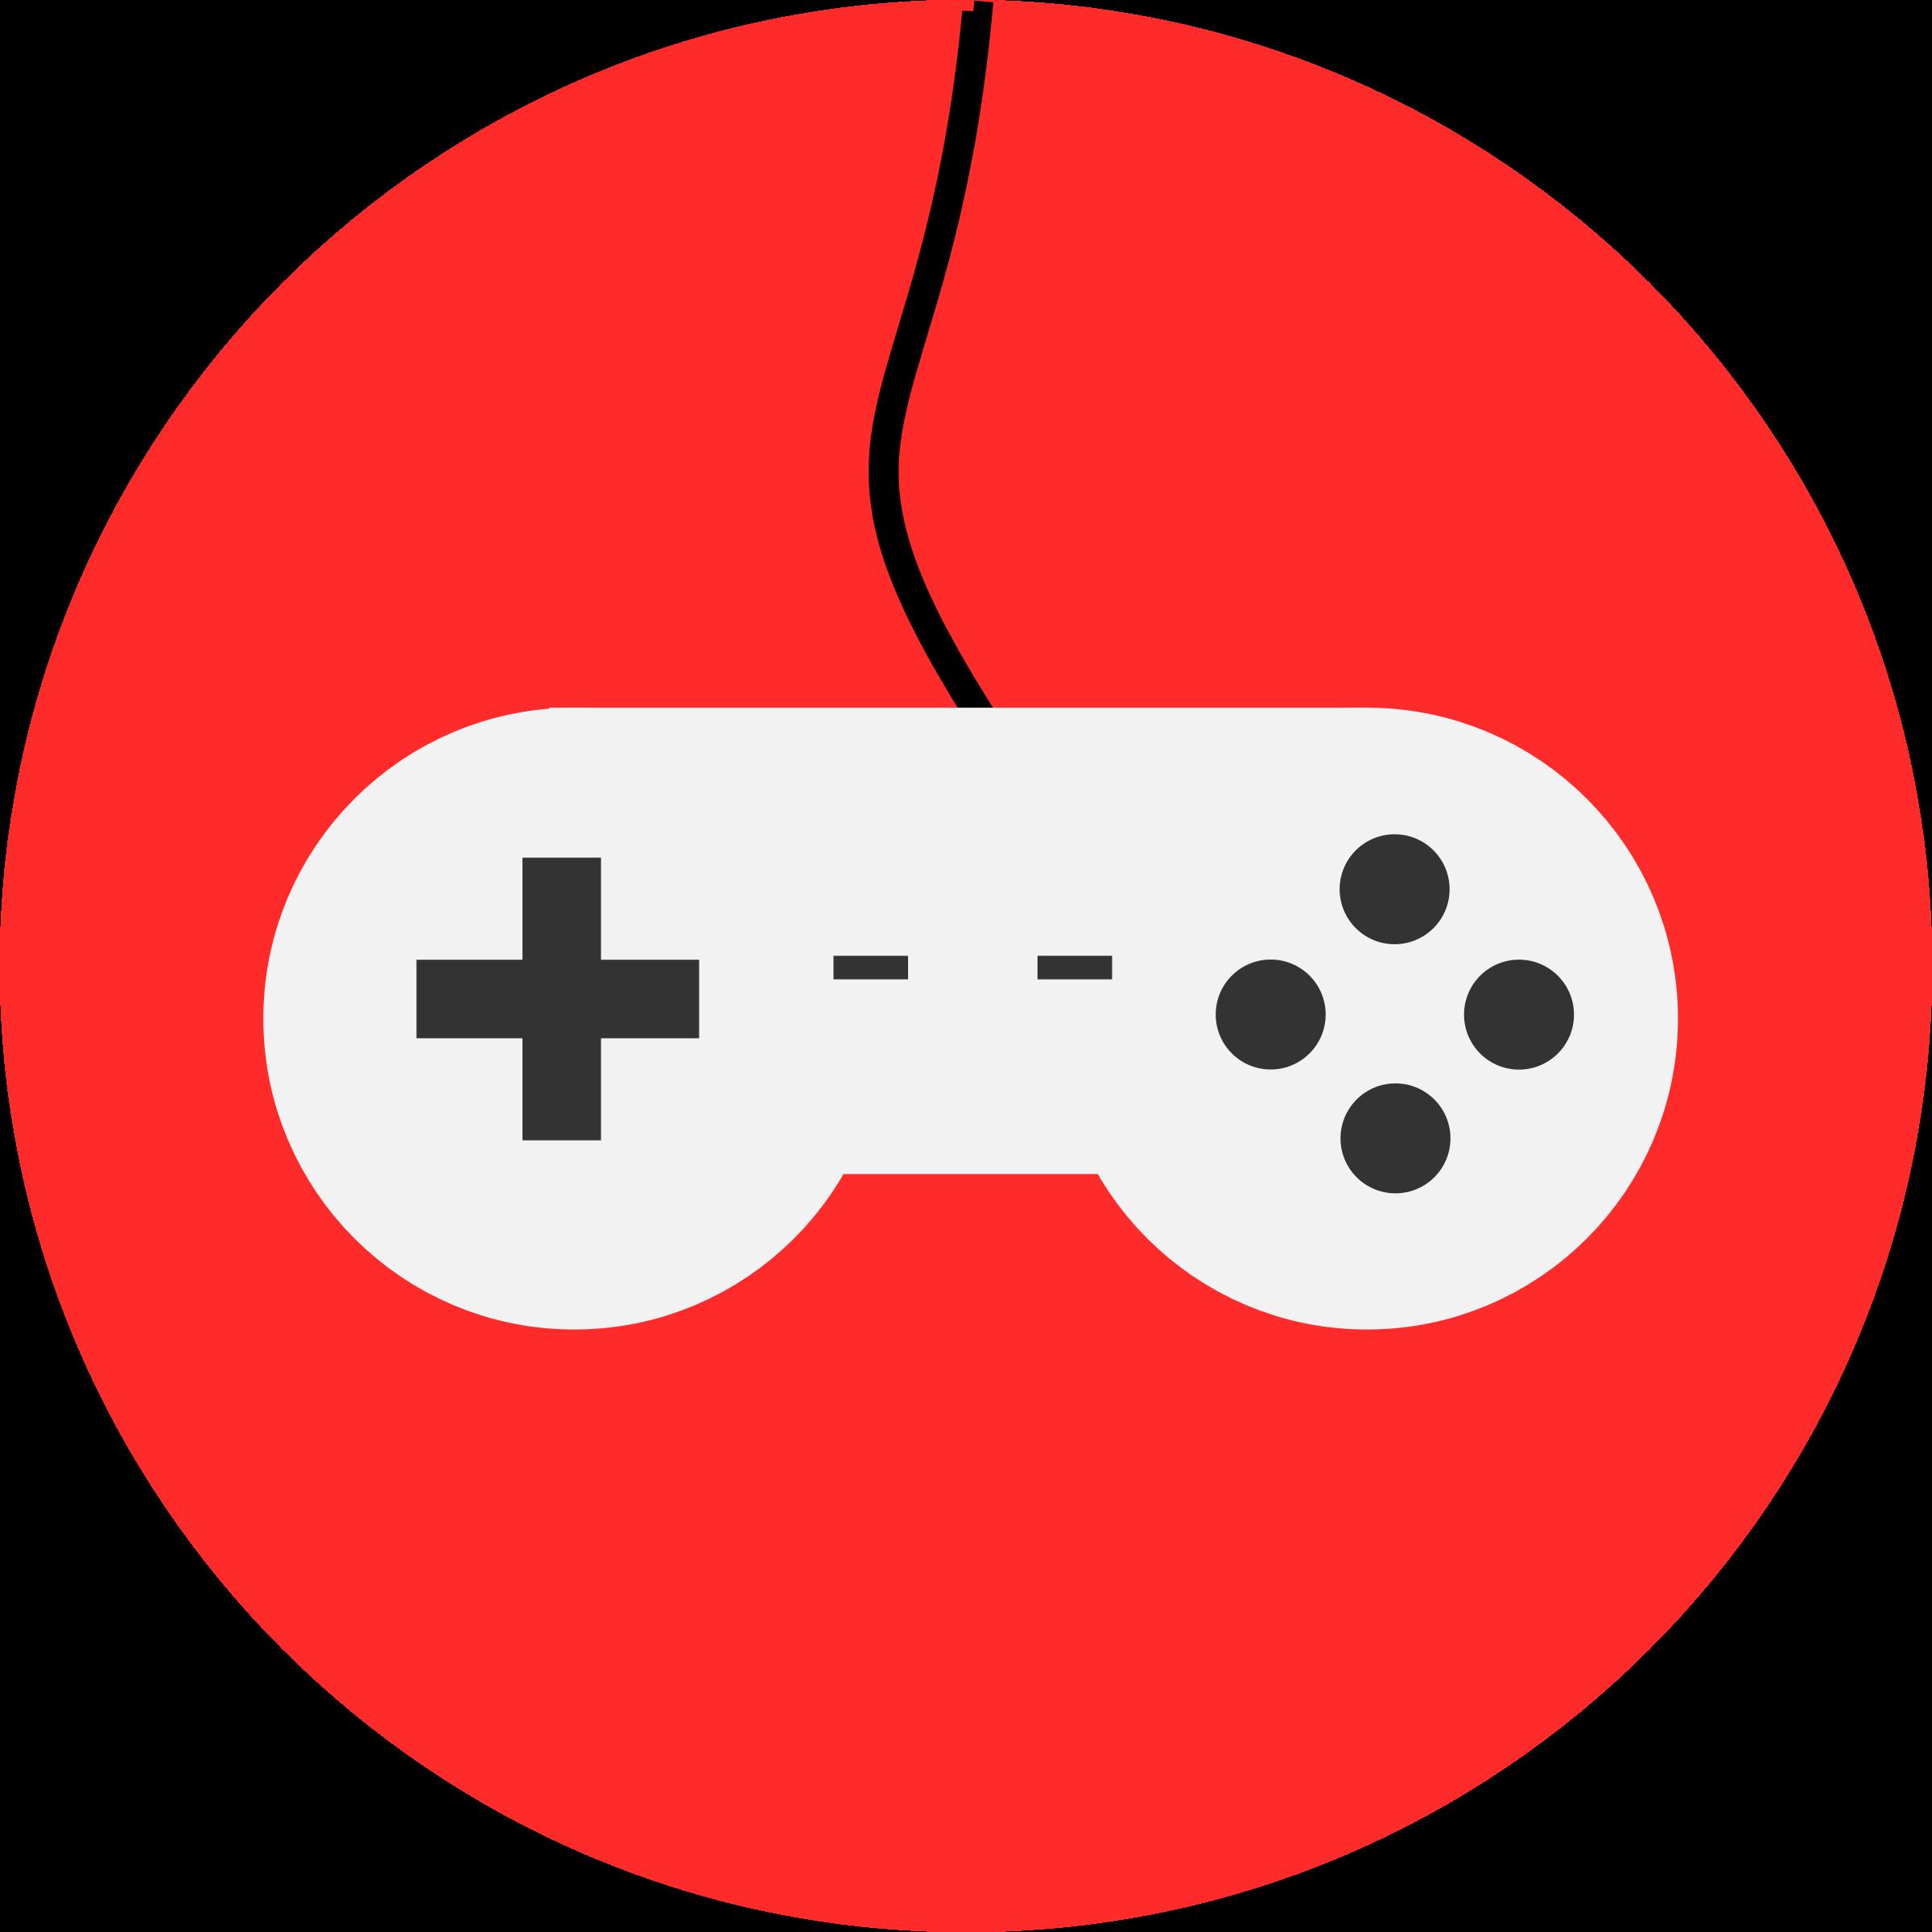 BIG IMAGE (PNG) - PNG Video Game